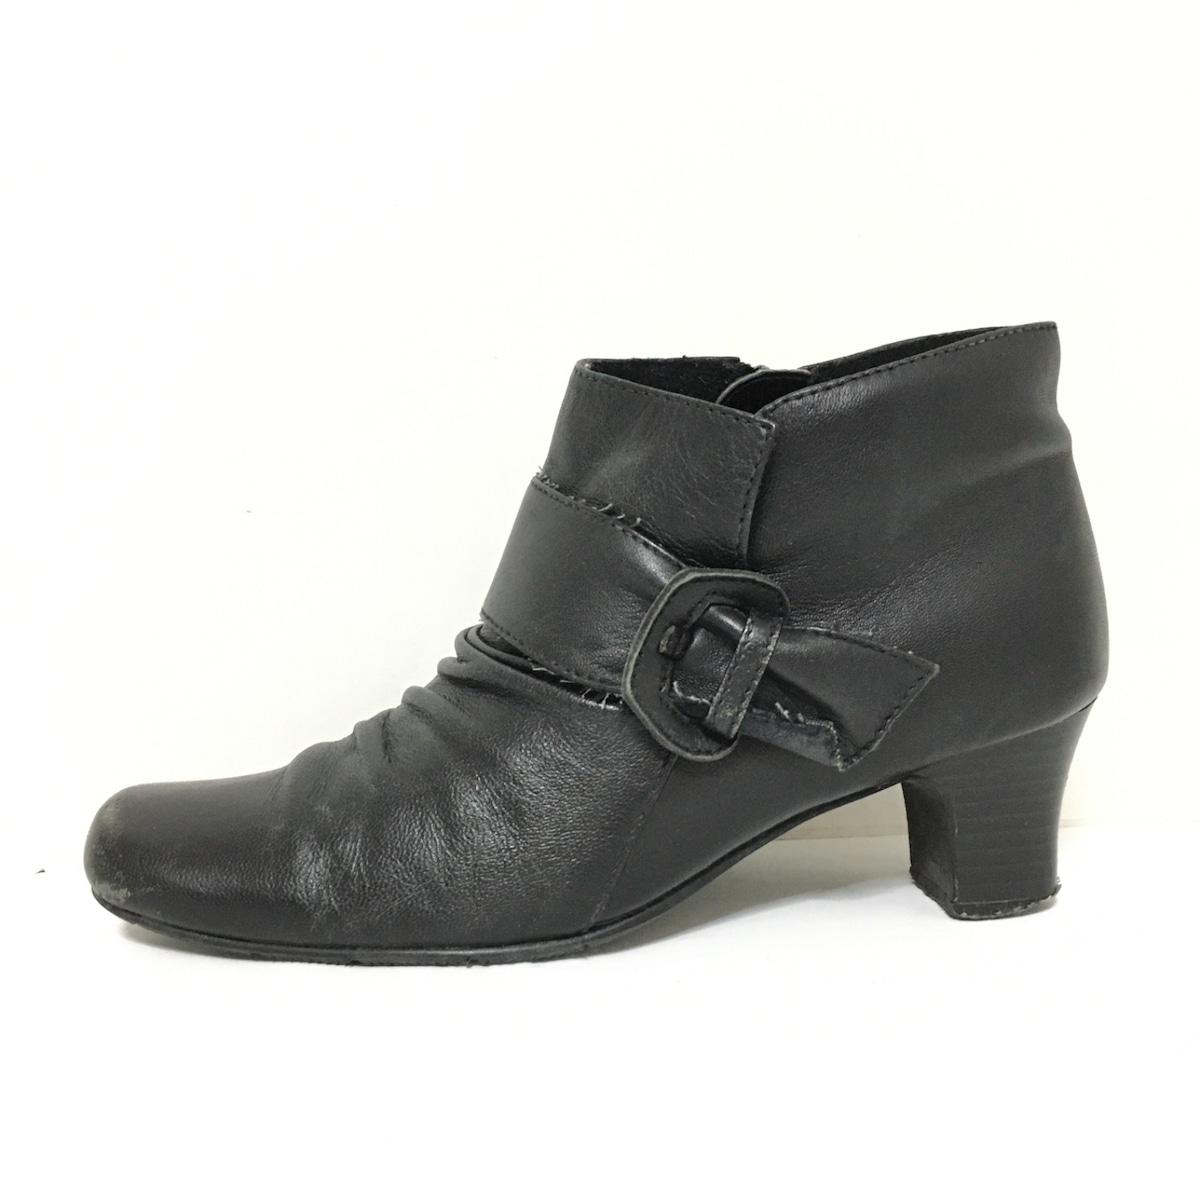 fauve(フォーブ)のブーツ